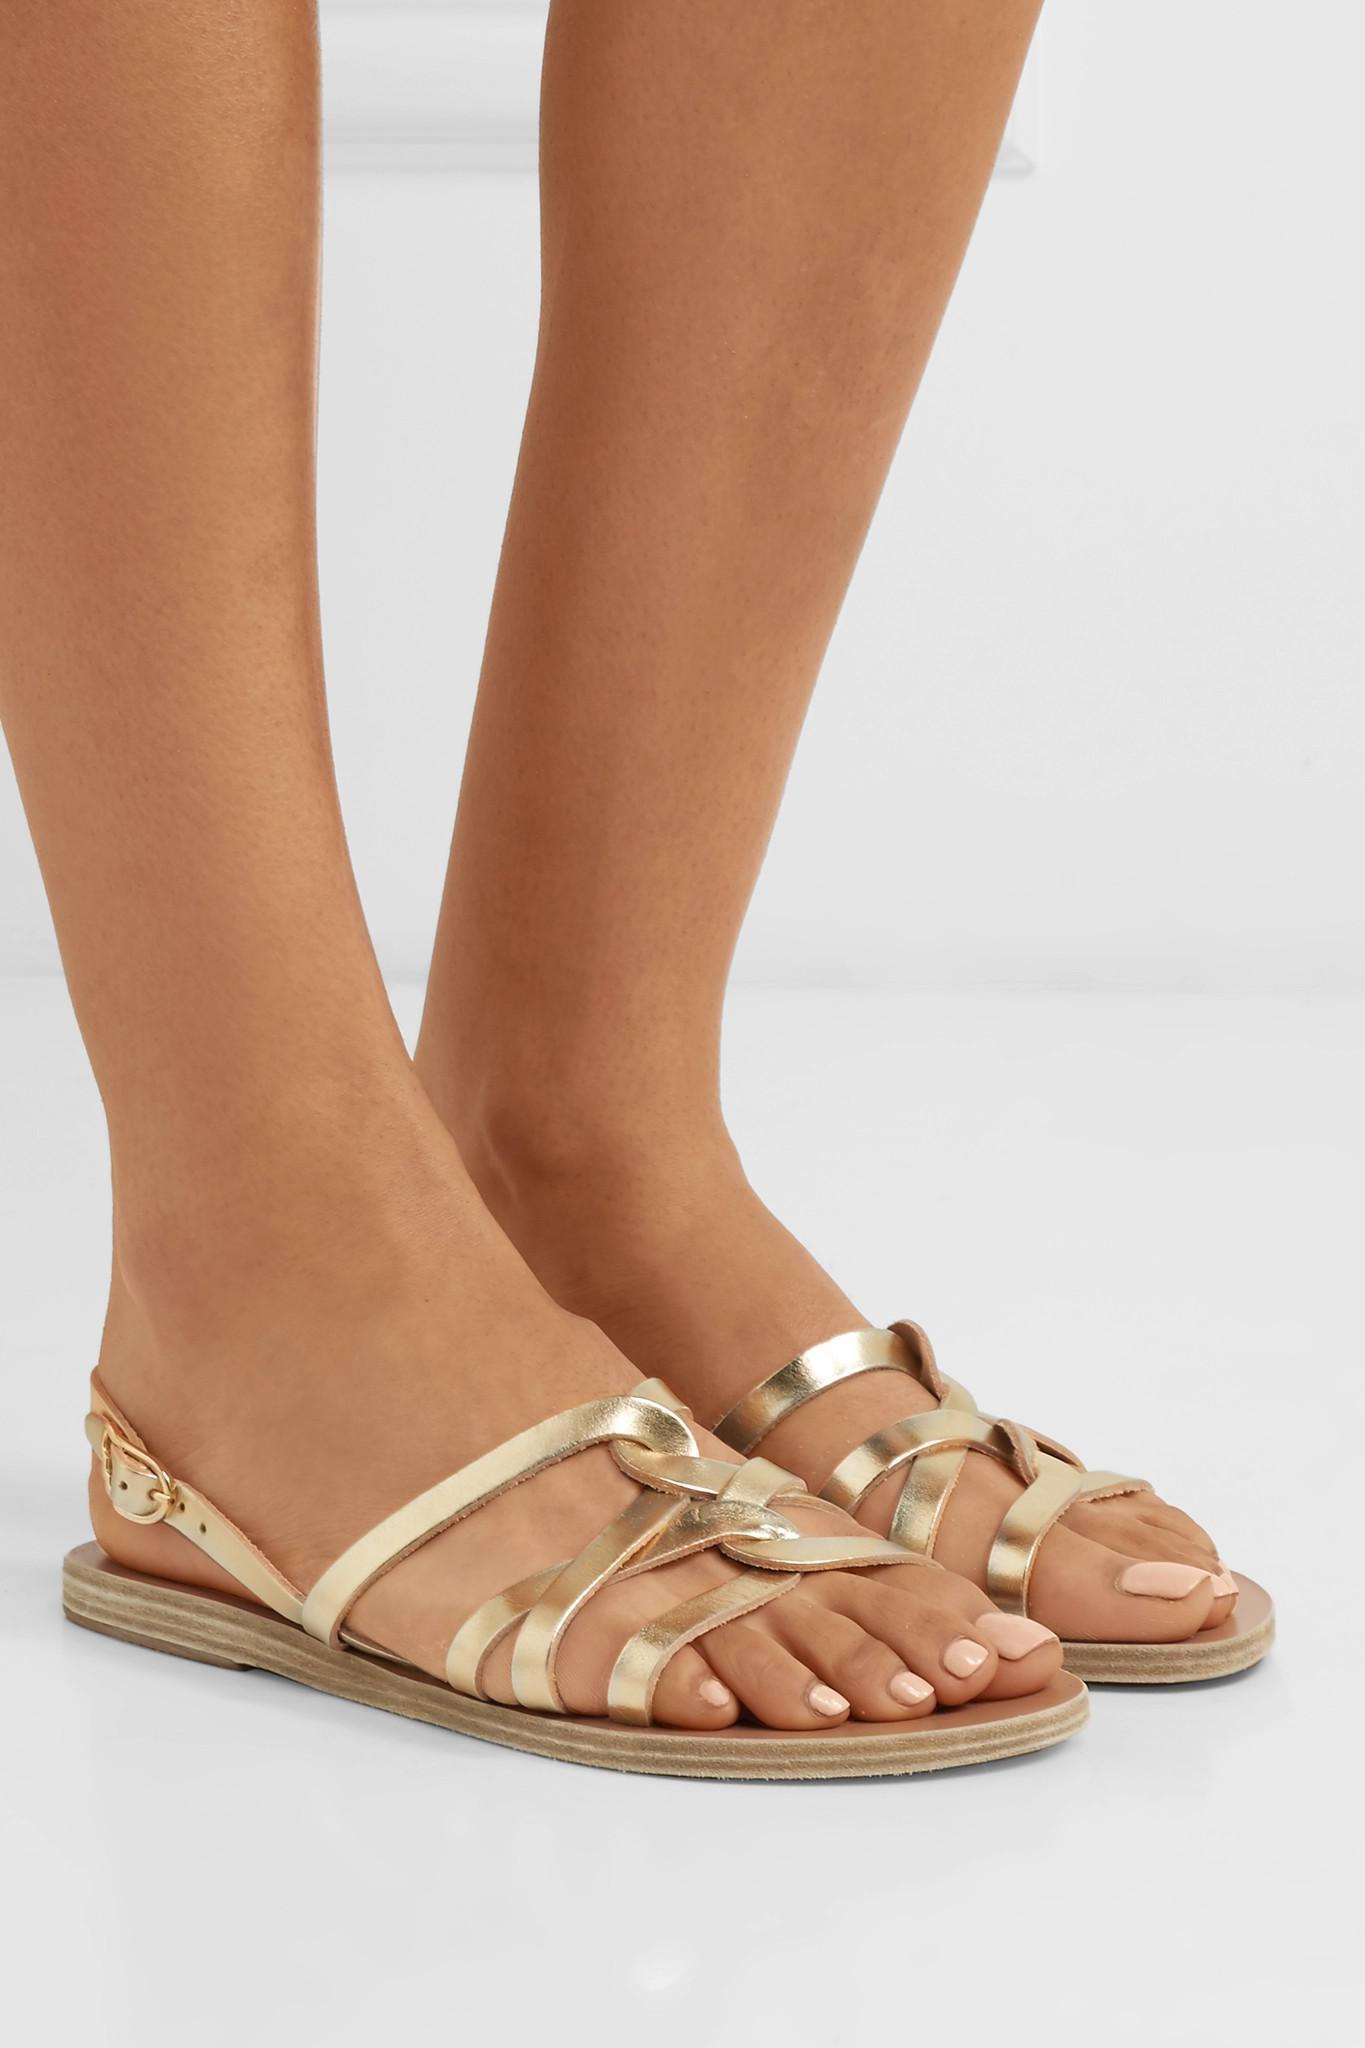 141a7f6f11a794 Ancient Greek Sandals - Schinousa Metallic Leather Sandals - Lyst. View  fullscreen